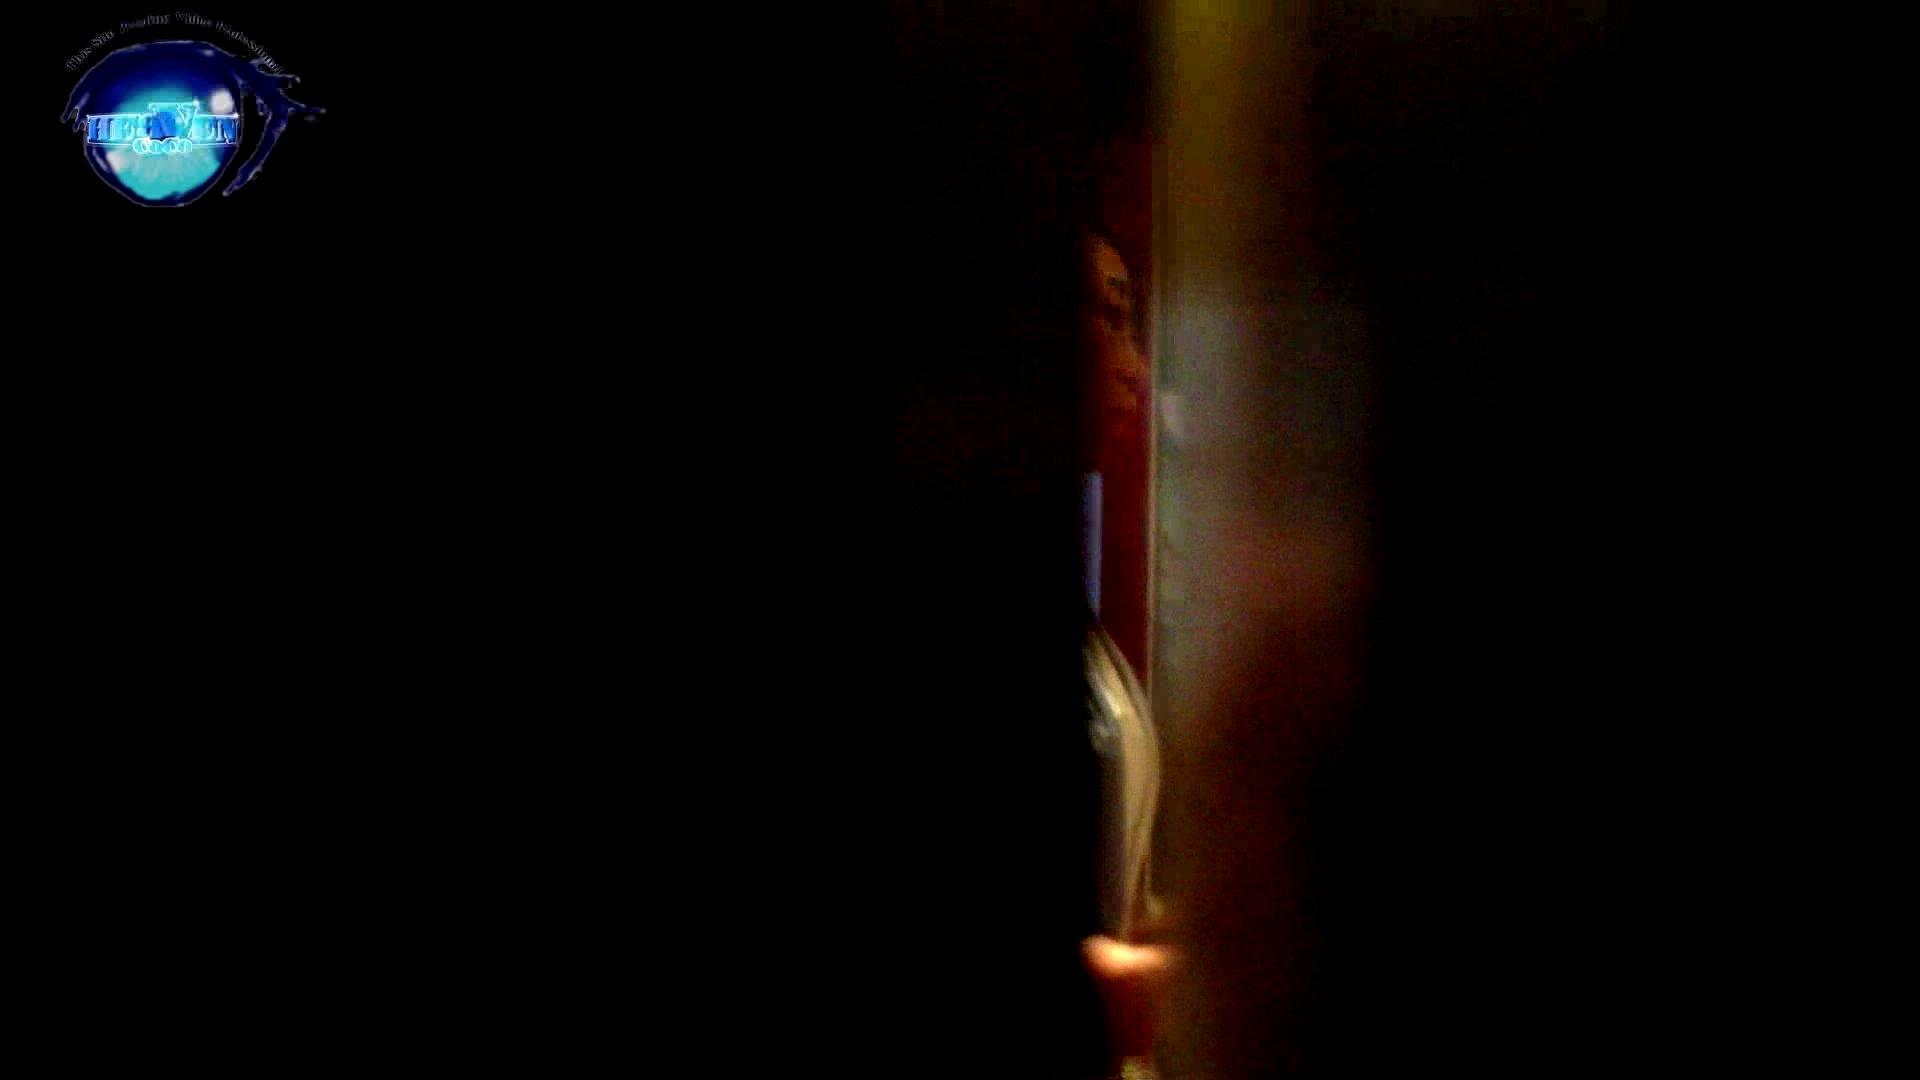 GOD HAND ファッションショッピングセンター盗撮vol.06 OLのエロ生活 | 盗撮  51連発 31